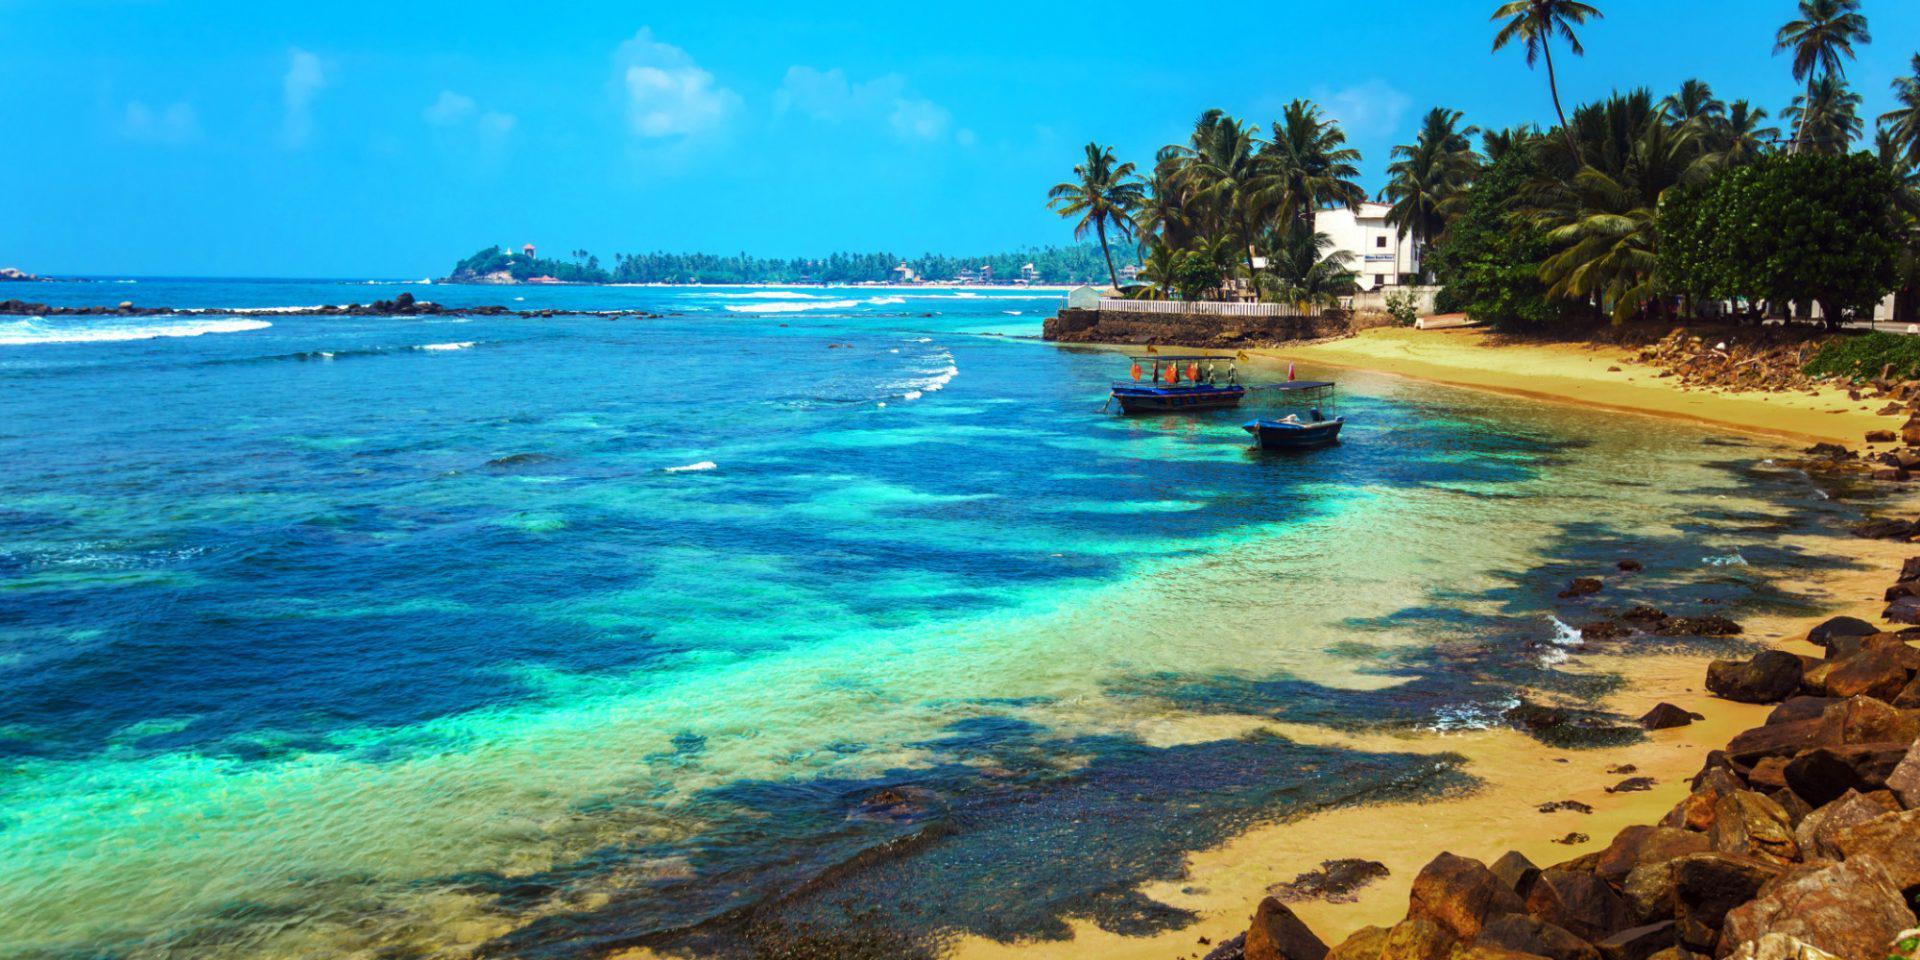 sri-lanka1 Μέρη που αξίζει να επισκεφτείς μέσα στο 2017 (μέρος β')